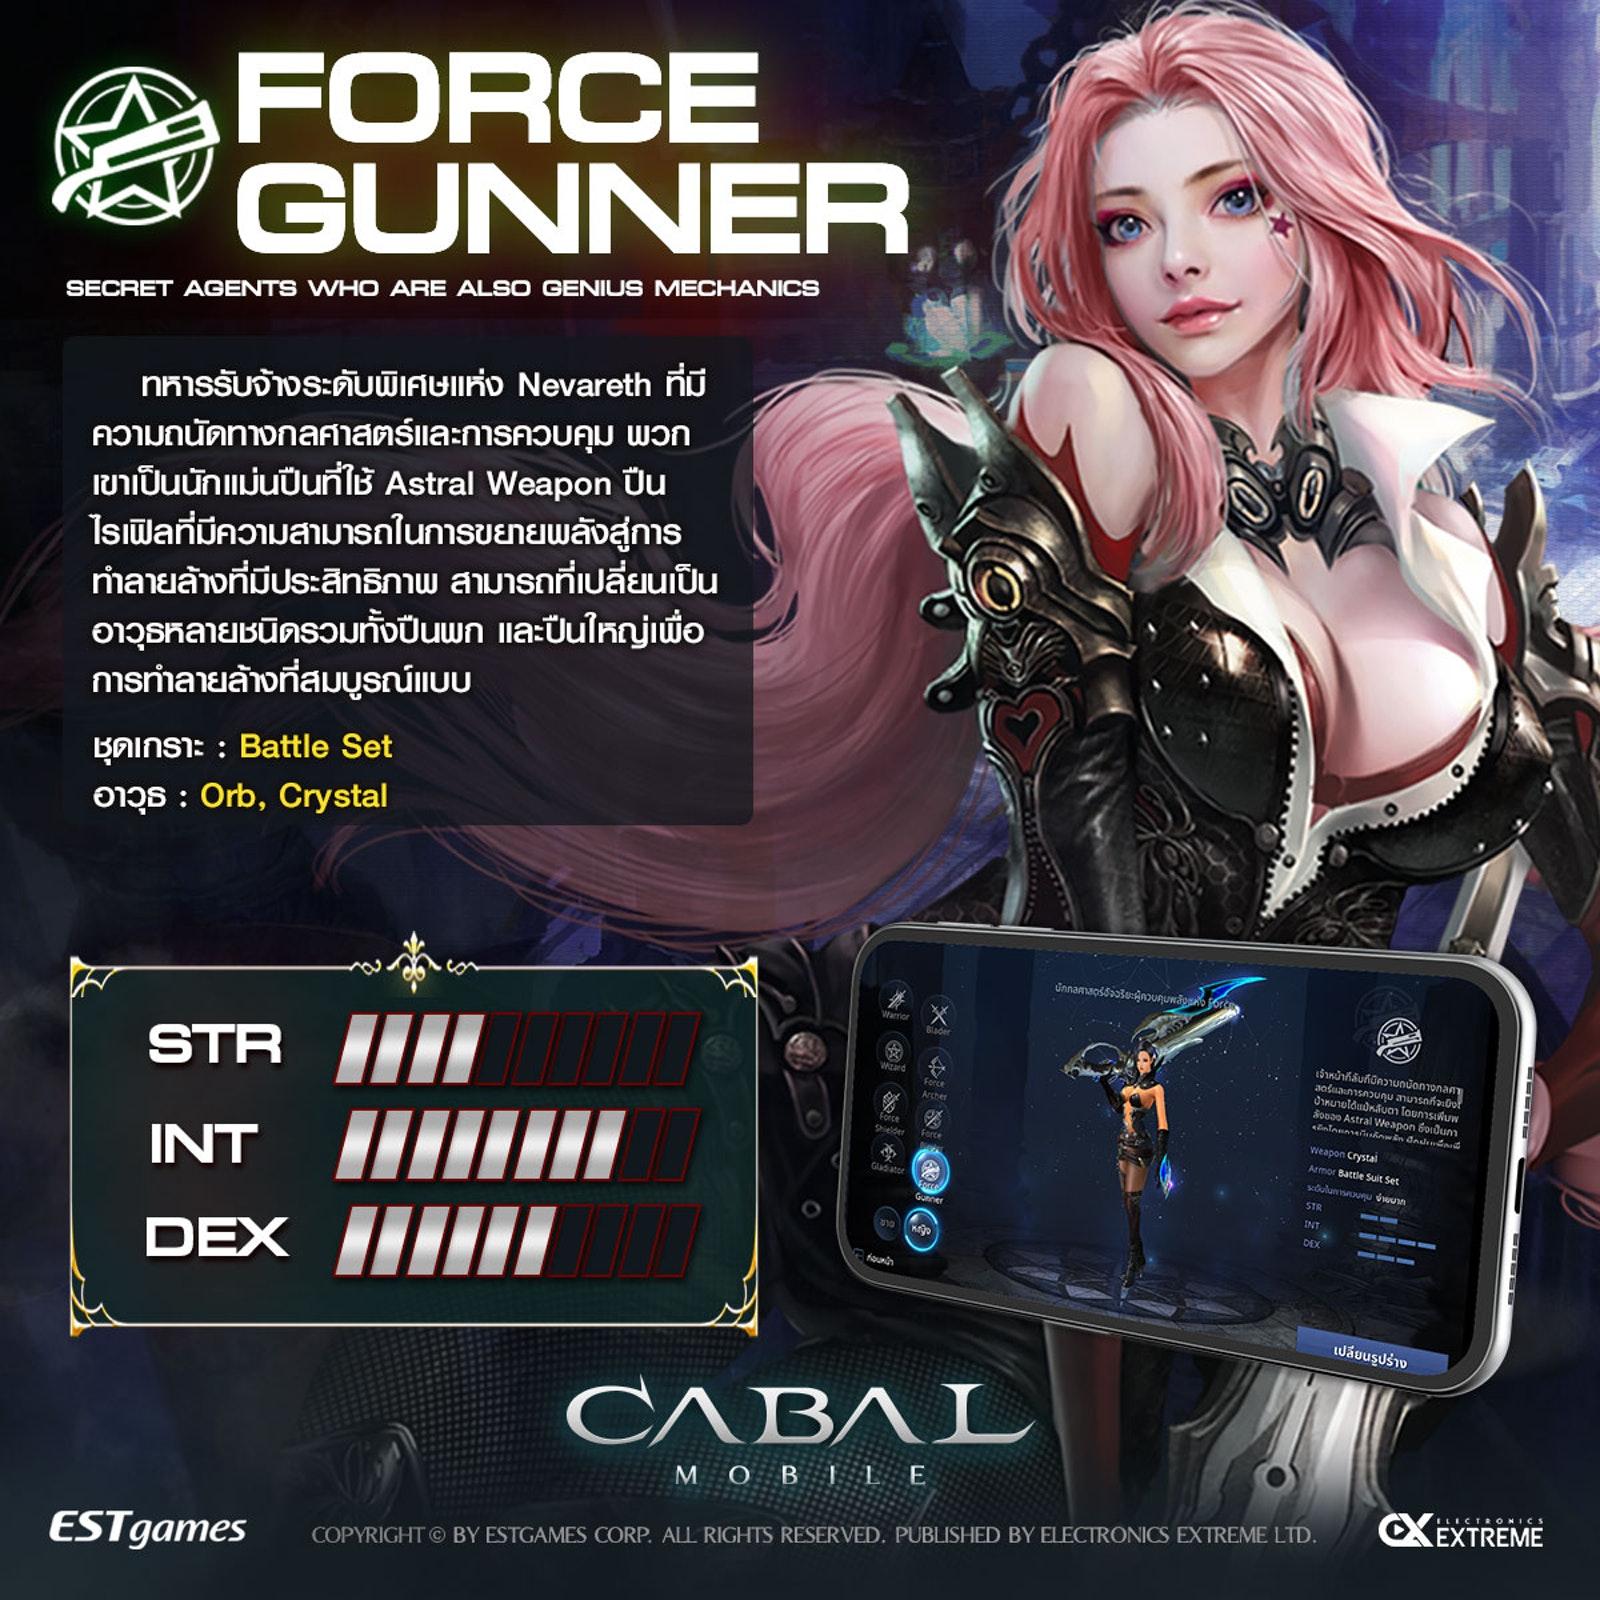 Cabal Mobile เปิดข้อมูล 8 อาชีพรู้แล้วเล่นเทพอย่างแน่นอน